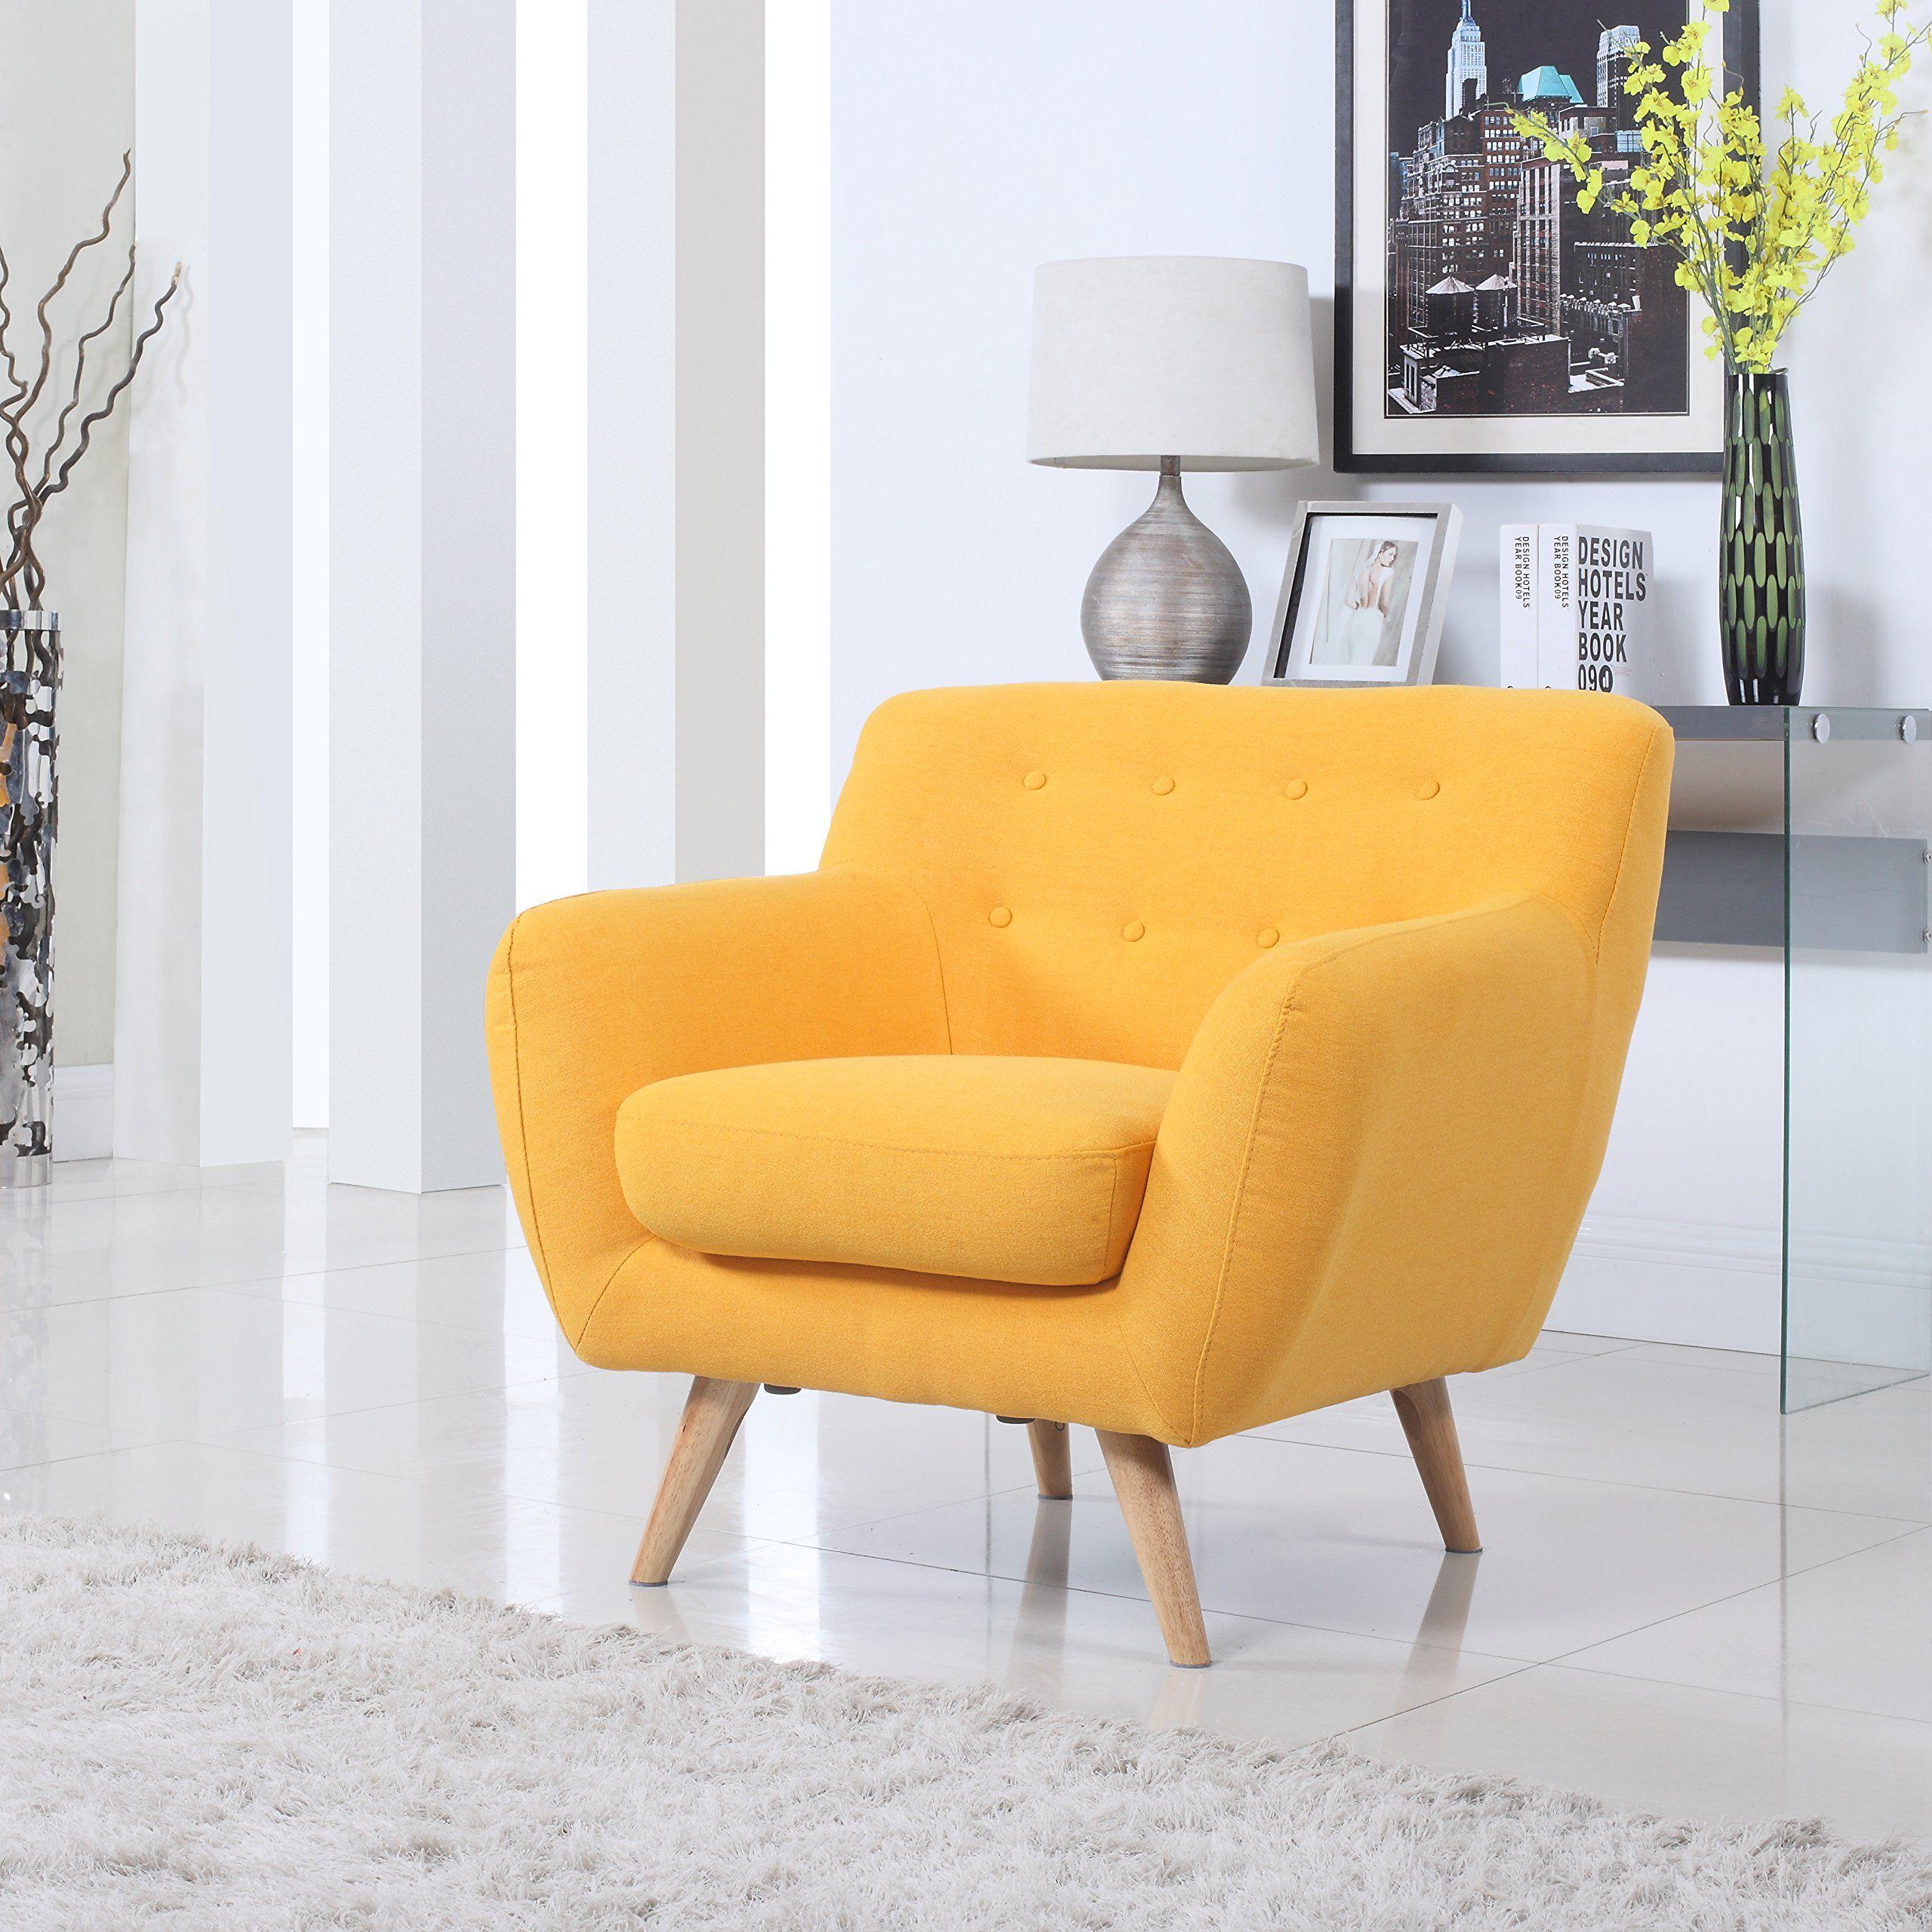 Divano Roma Furniture Modern Mid Century Accent Chair